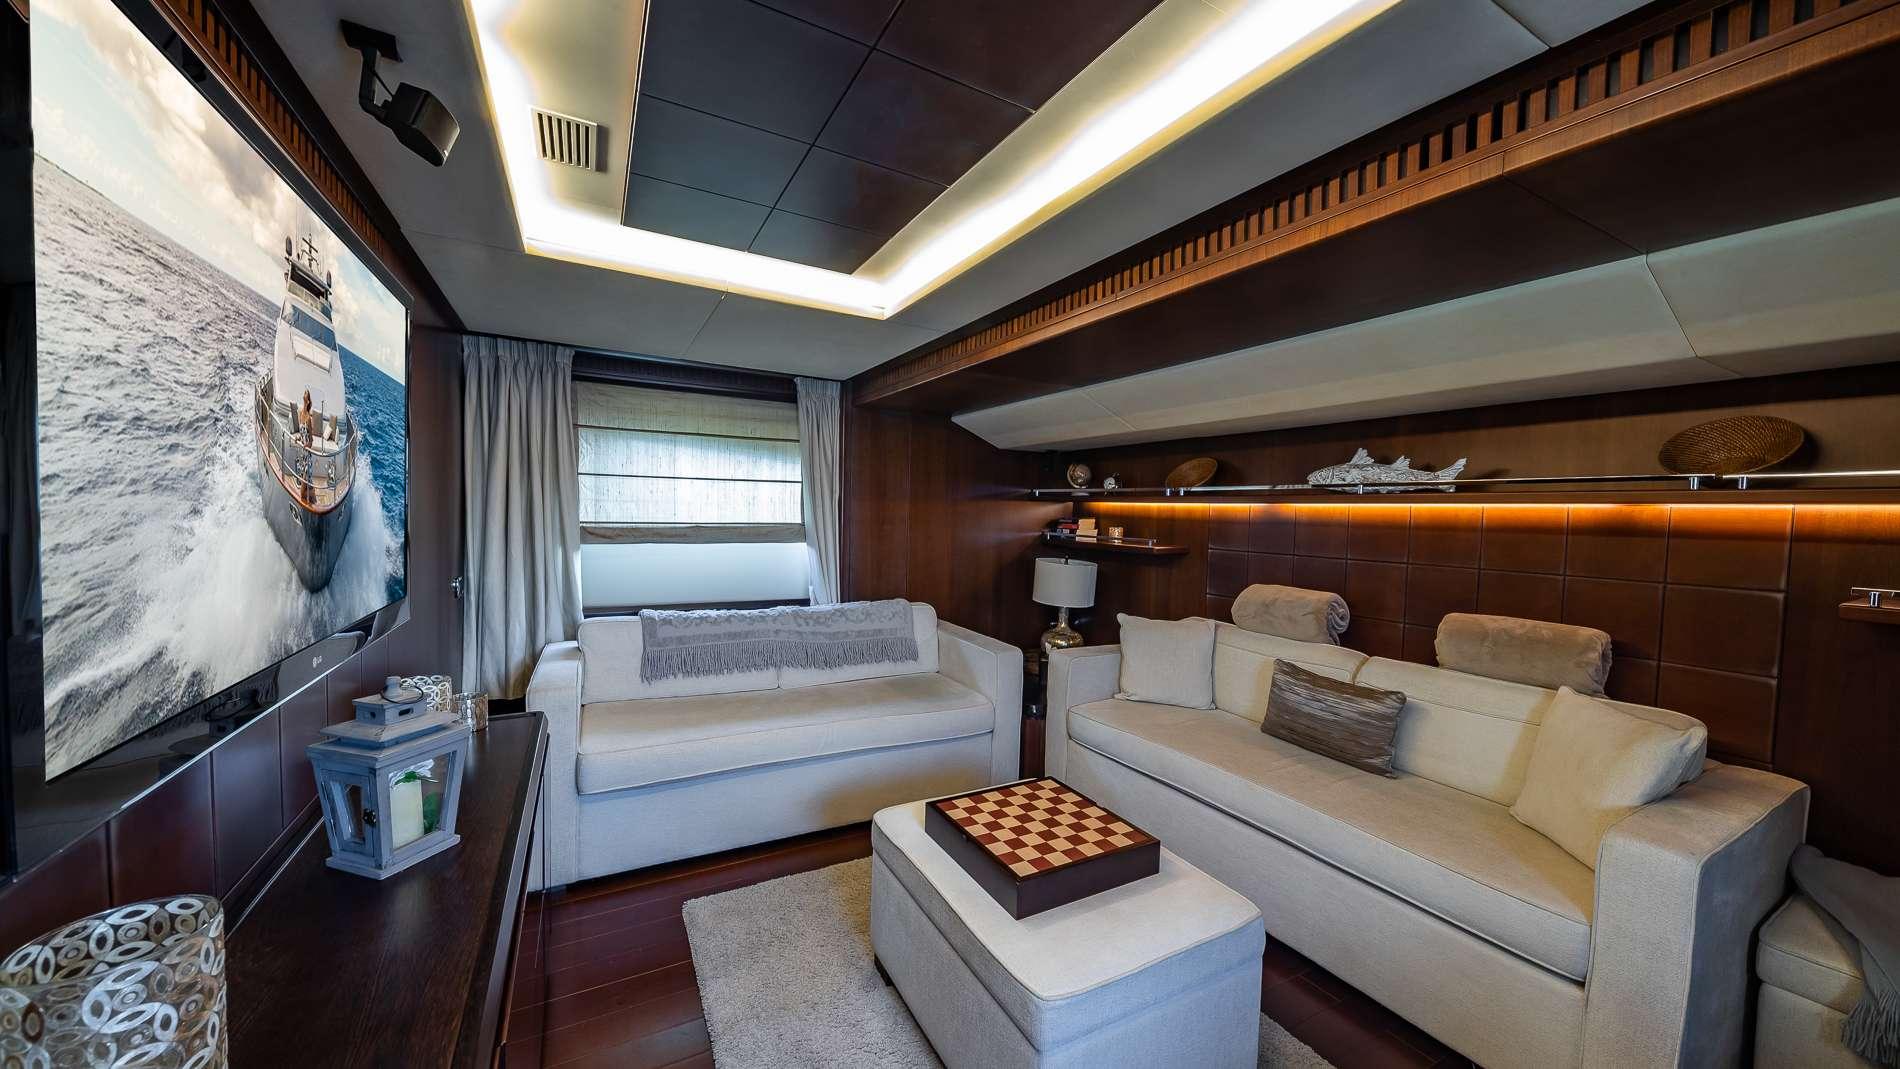 Motor Yacht 'TAIL LIGHTS' Media Room, 12 PAX, 6 Crew, 116.00 Ft, 35.00 Meters, Built 2011, Azimut, Refit Year 2016